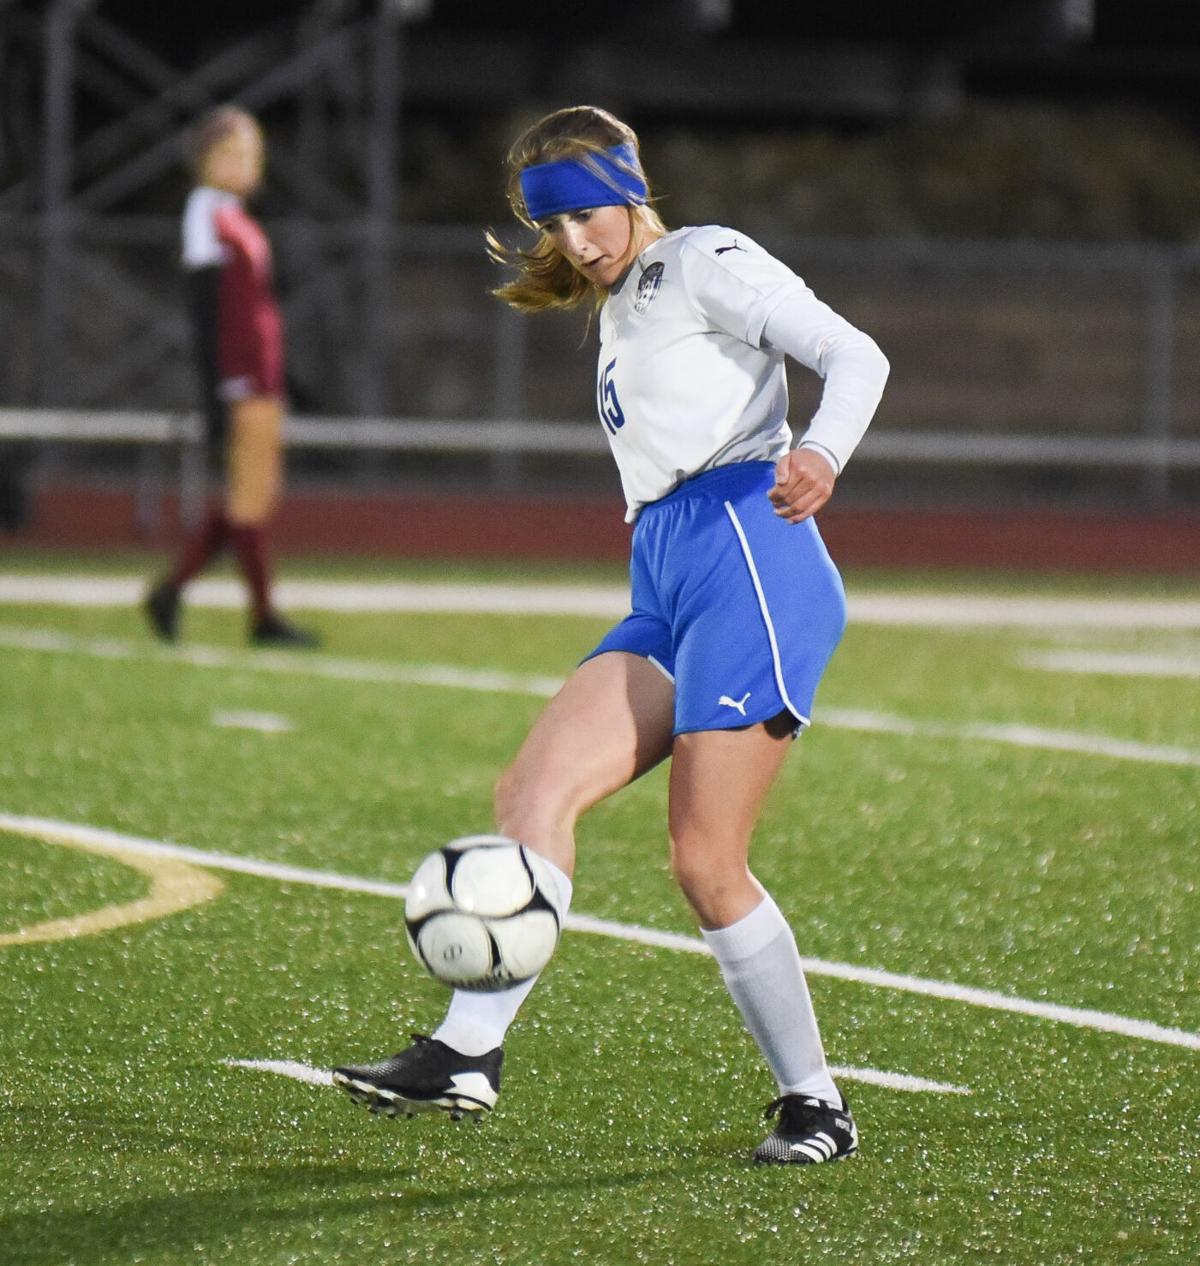 PIAA Girls Soccer - Cambridge Springs vs. Greensburg Central Catholic